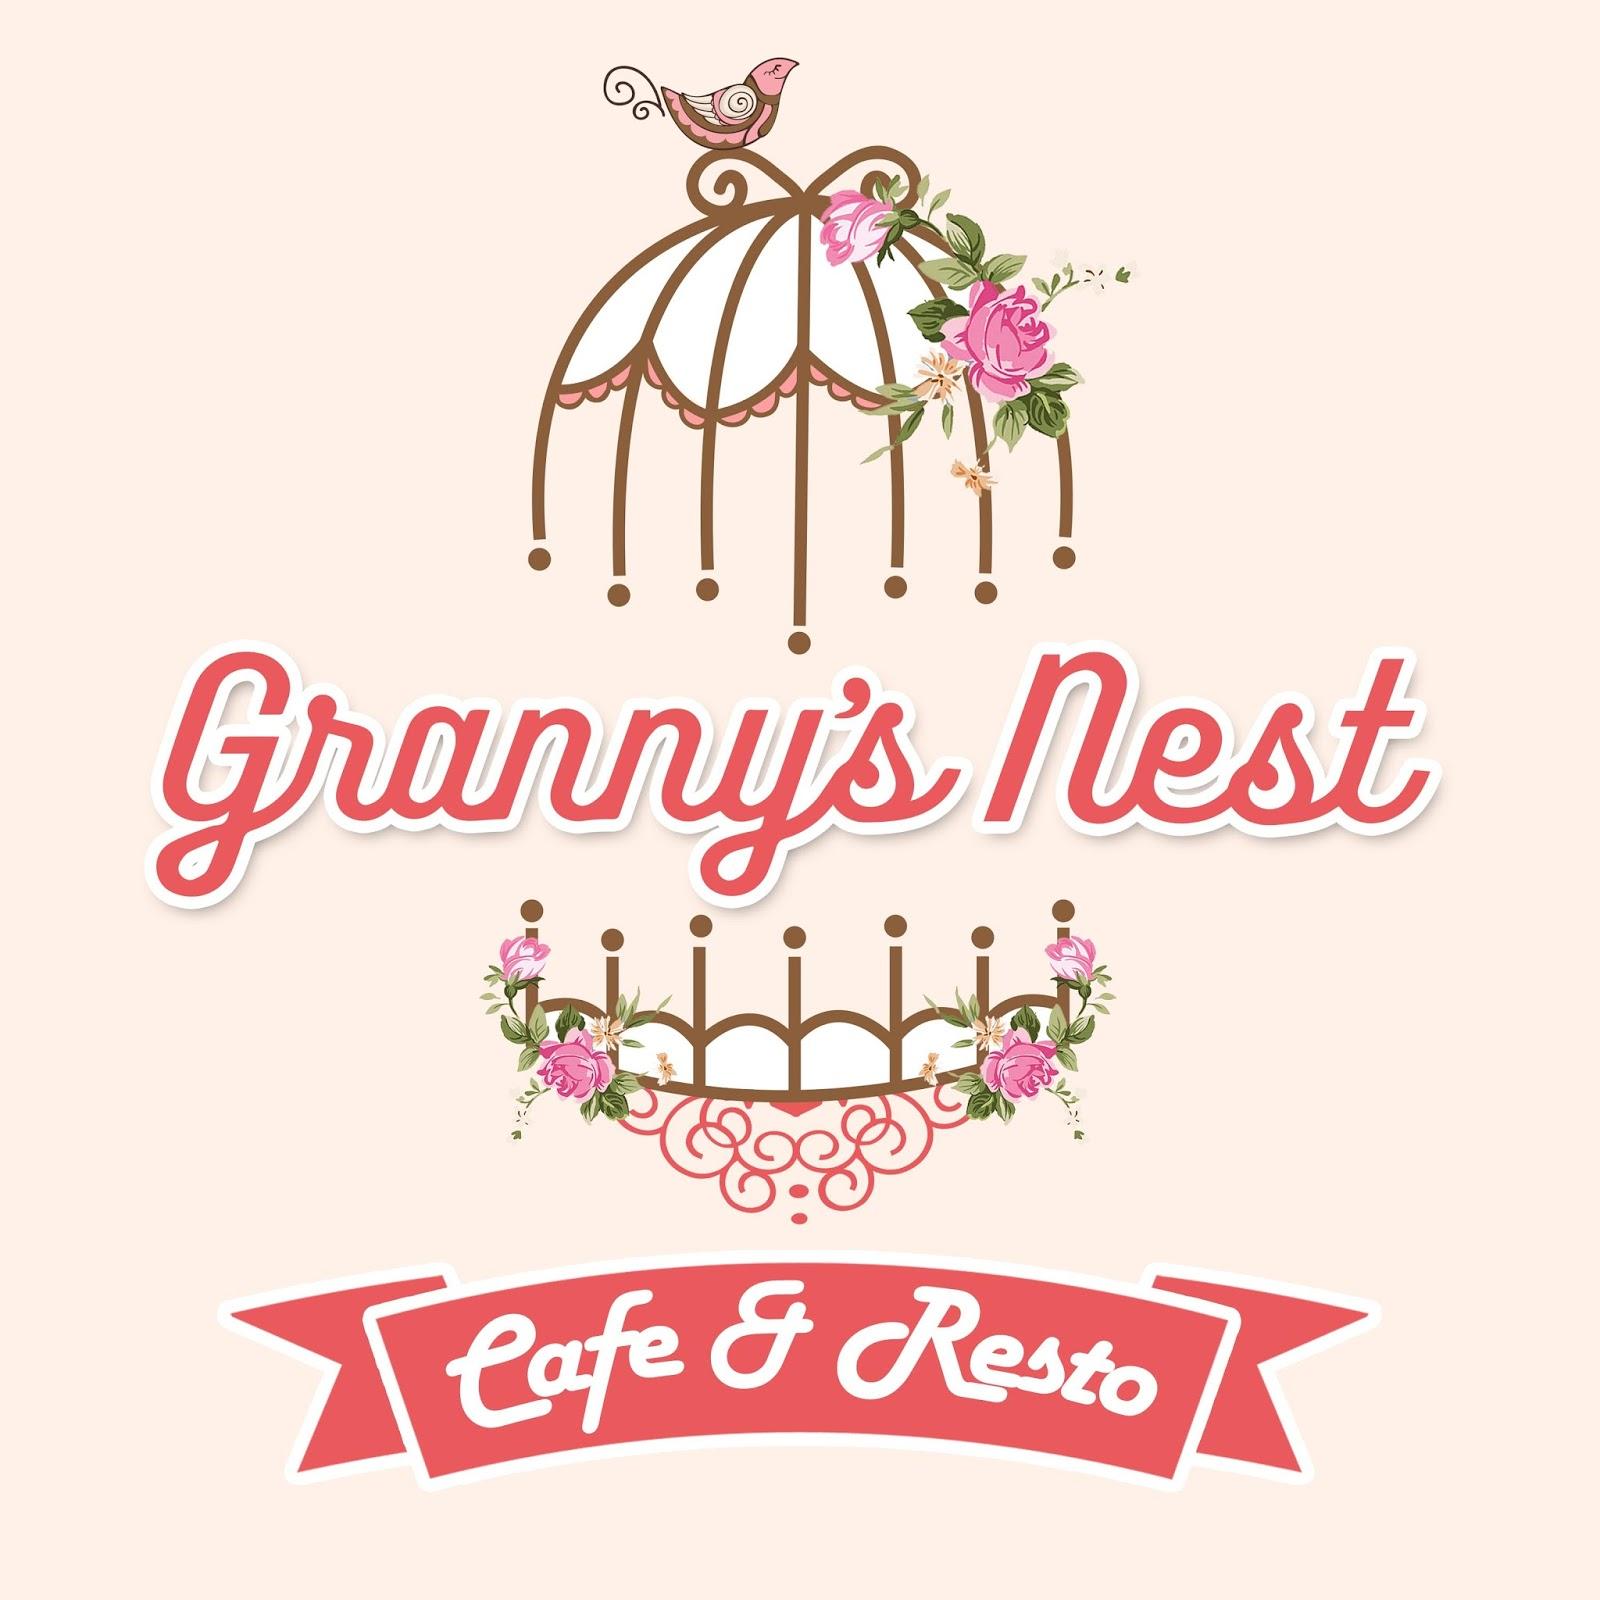 Bursa Kerja Granny's Nest Cafe and Resto Bandar Lampung